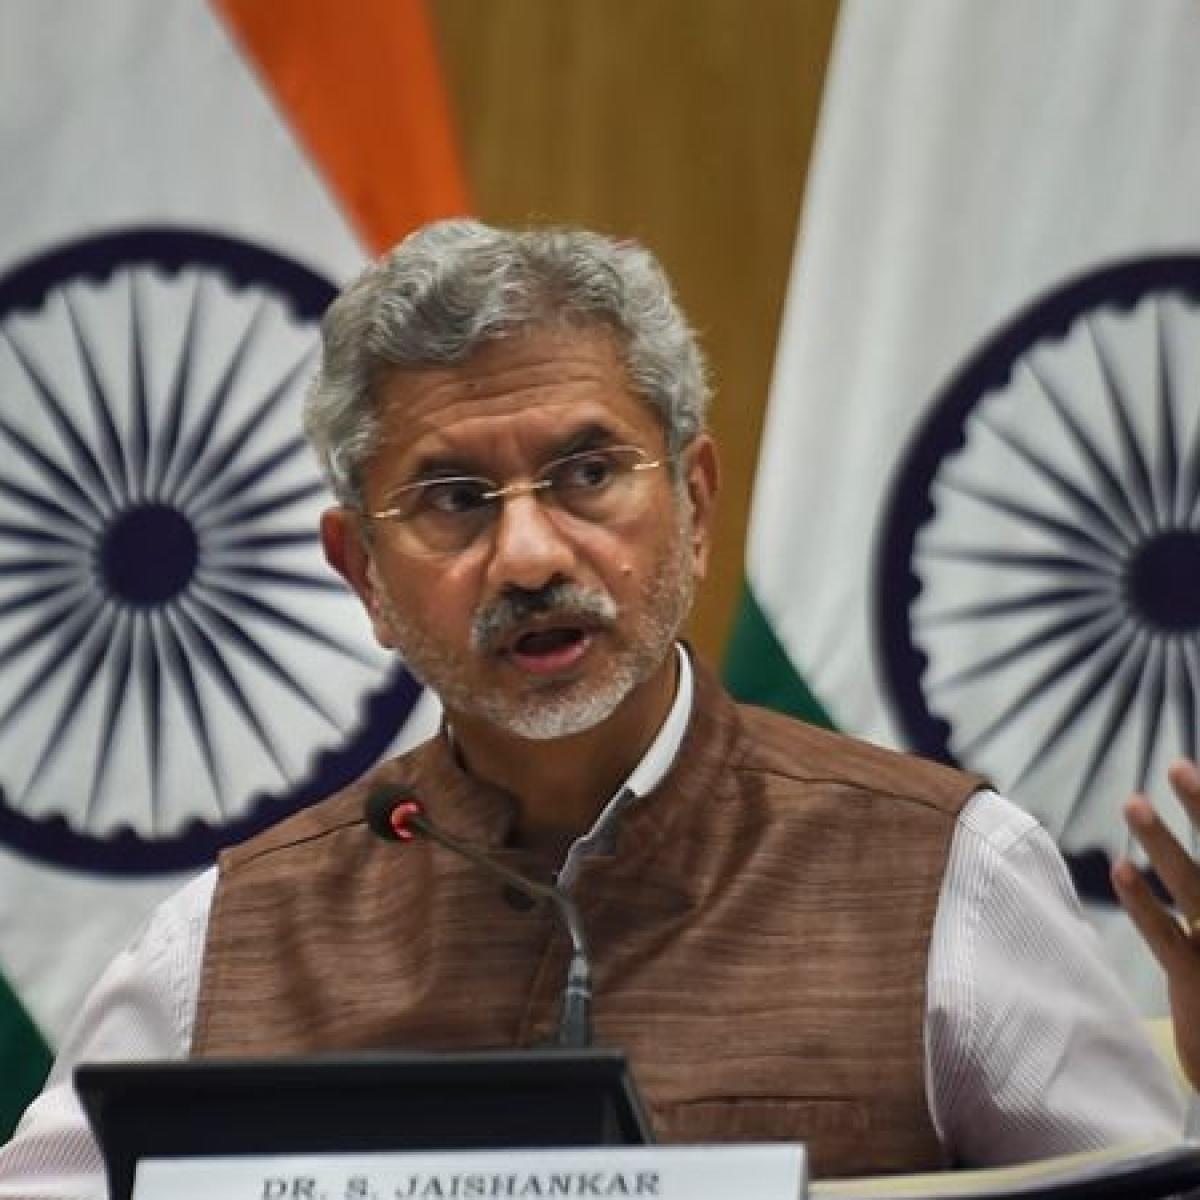 External Affairs Minister Jaishankar urges BRICS' support in UN Security Council reforms